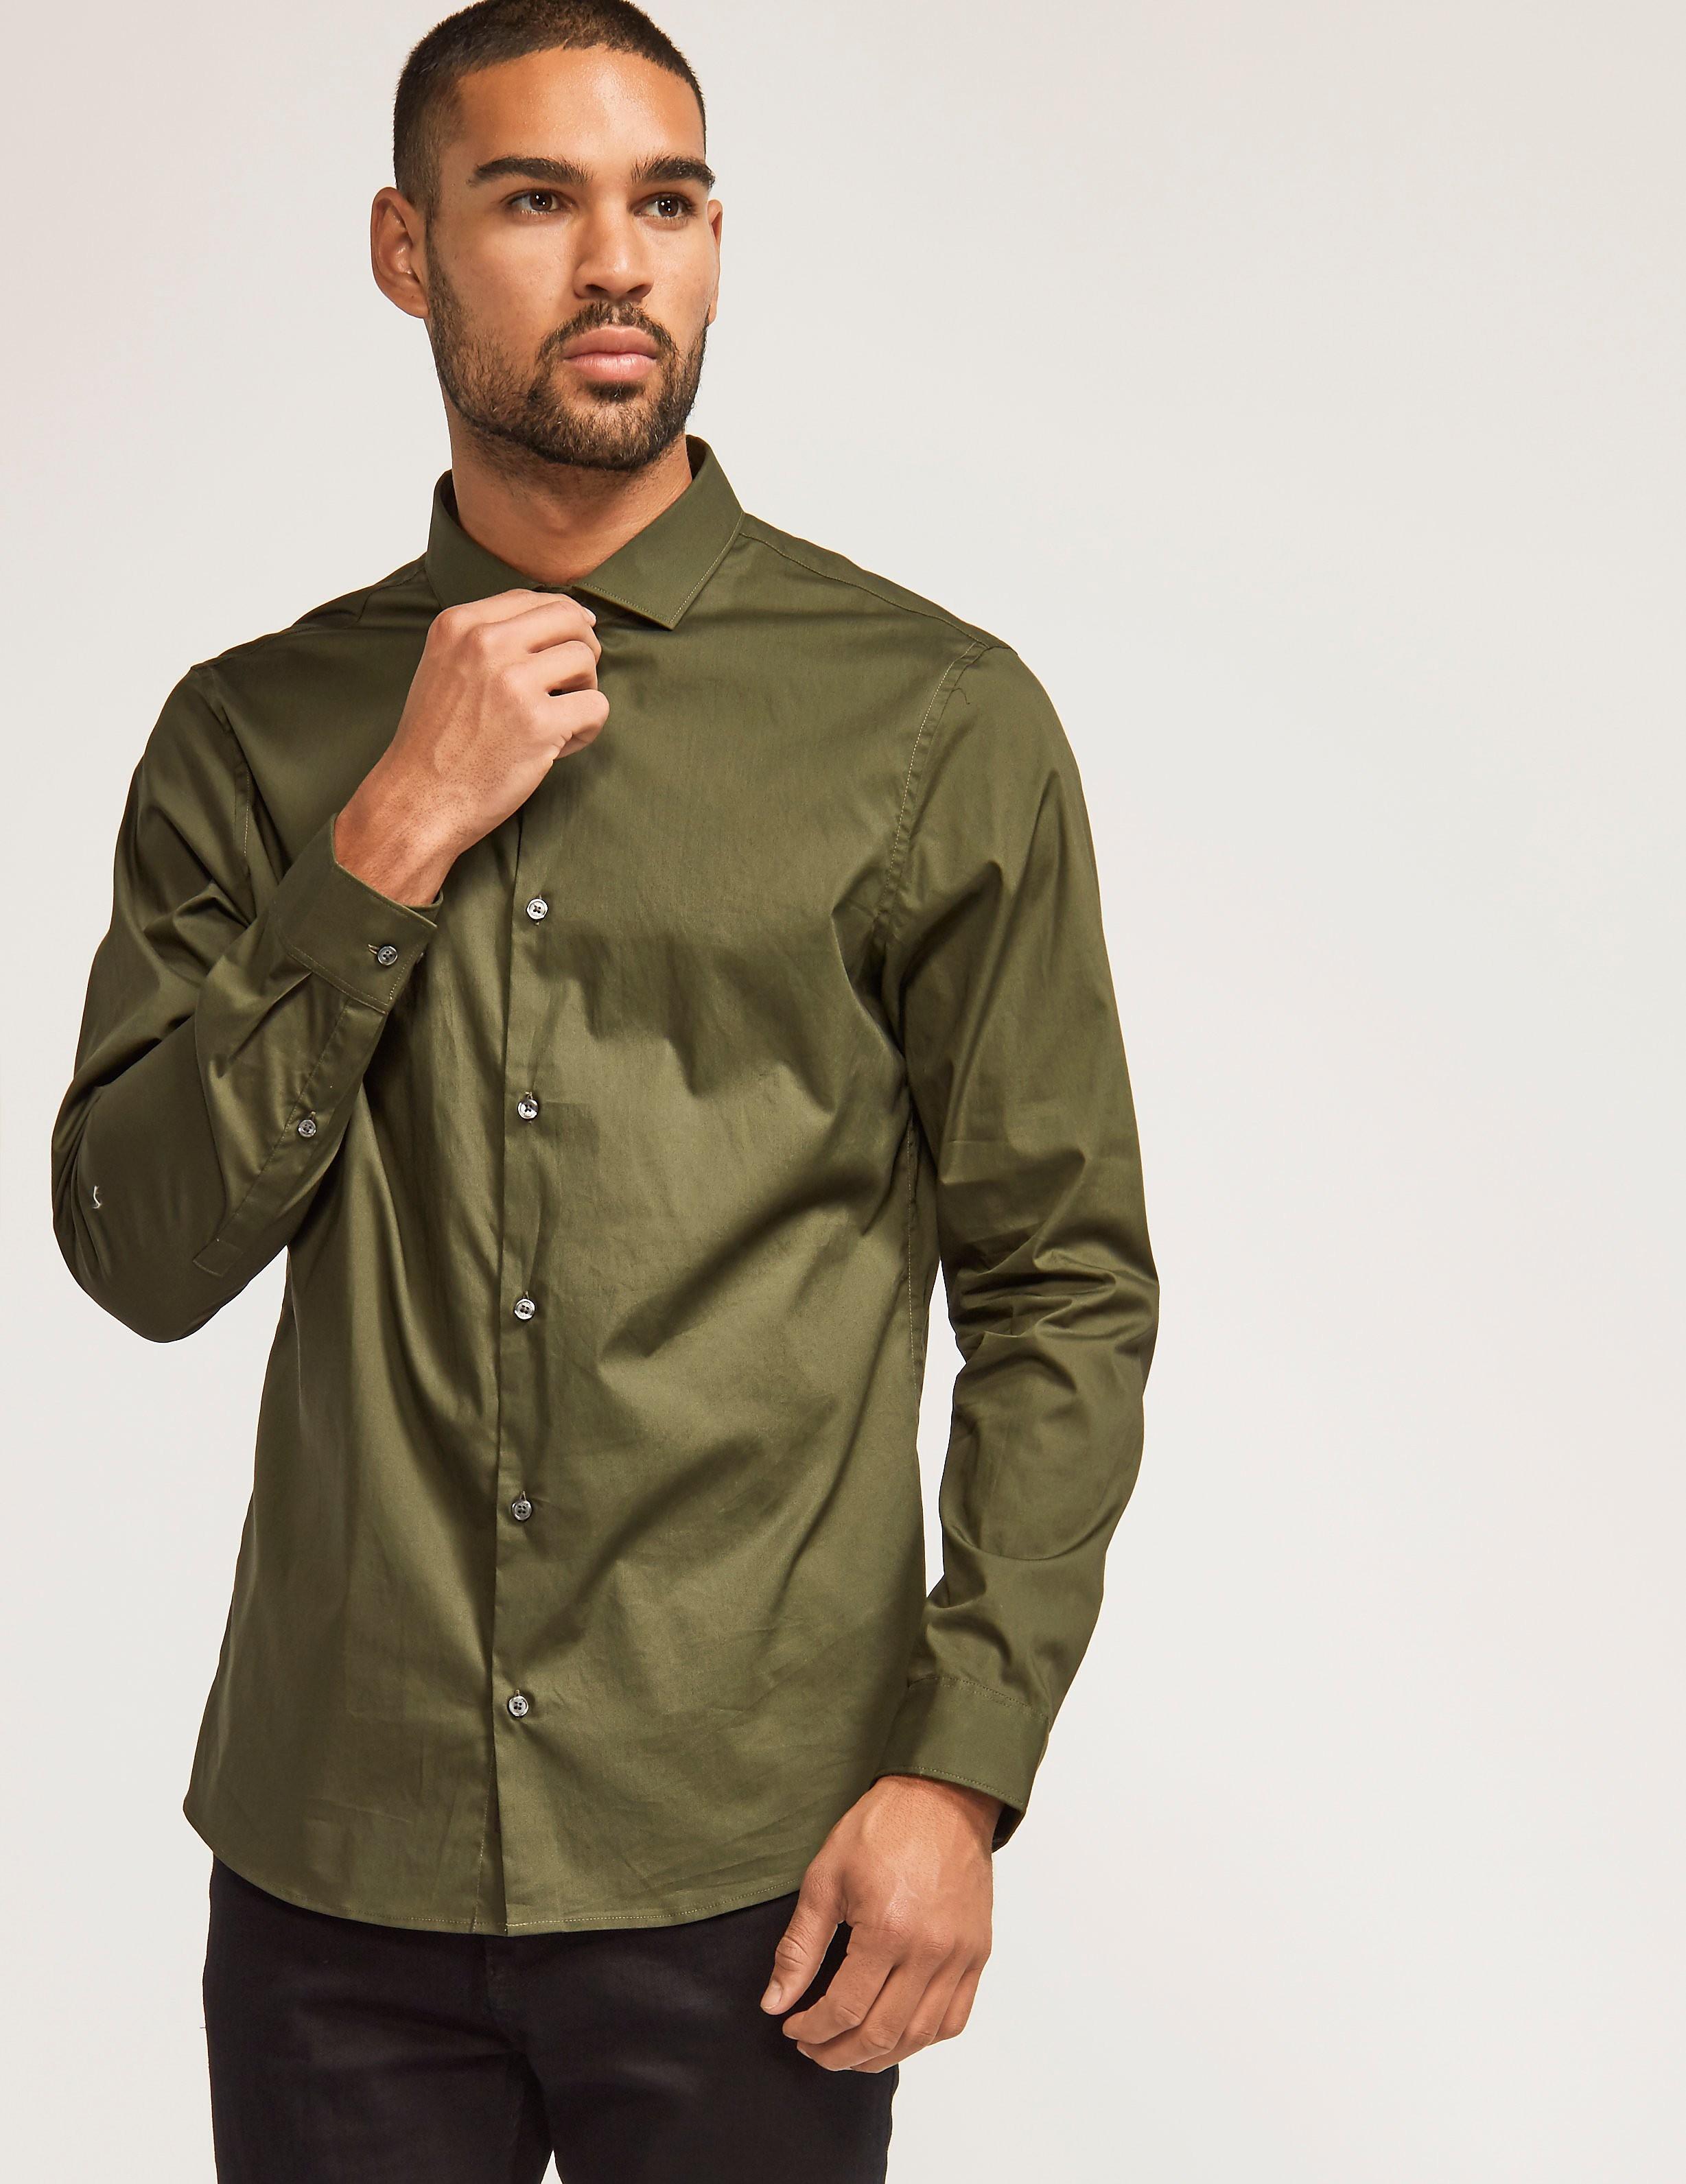 Michael Kors Slim Fit Stretch Shirt